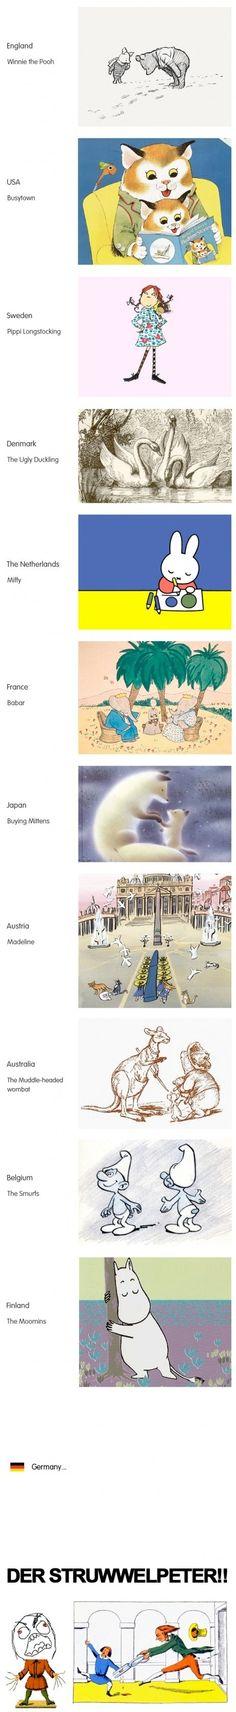 classic children's books.